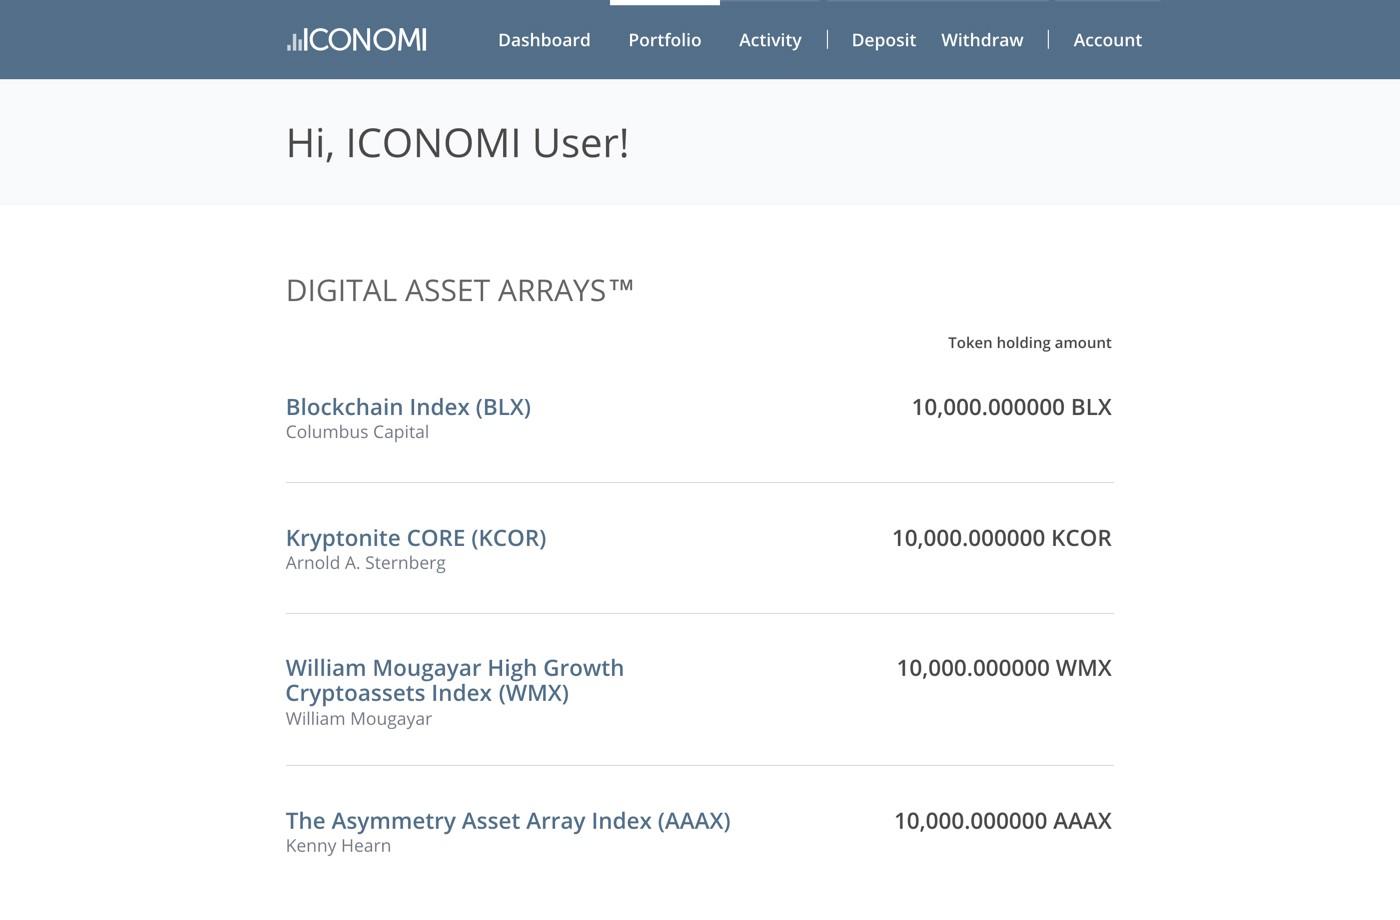 Платформа ICONOMI представила 12 новых управляющих активами